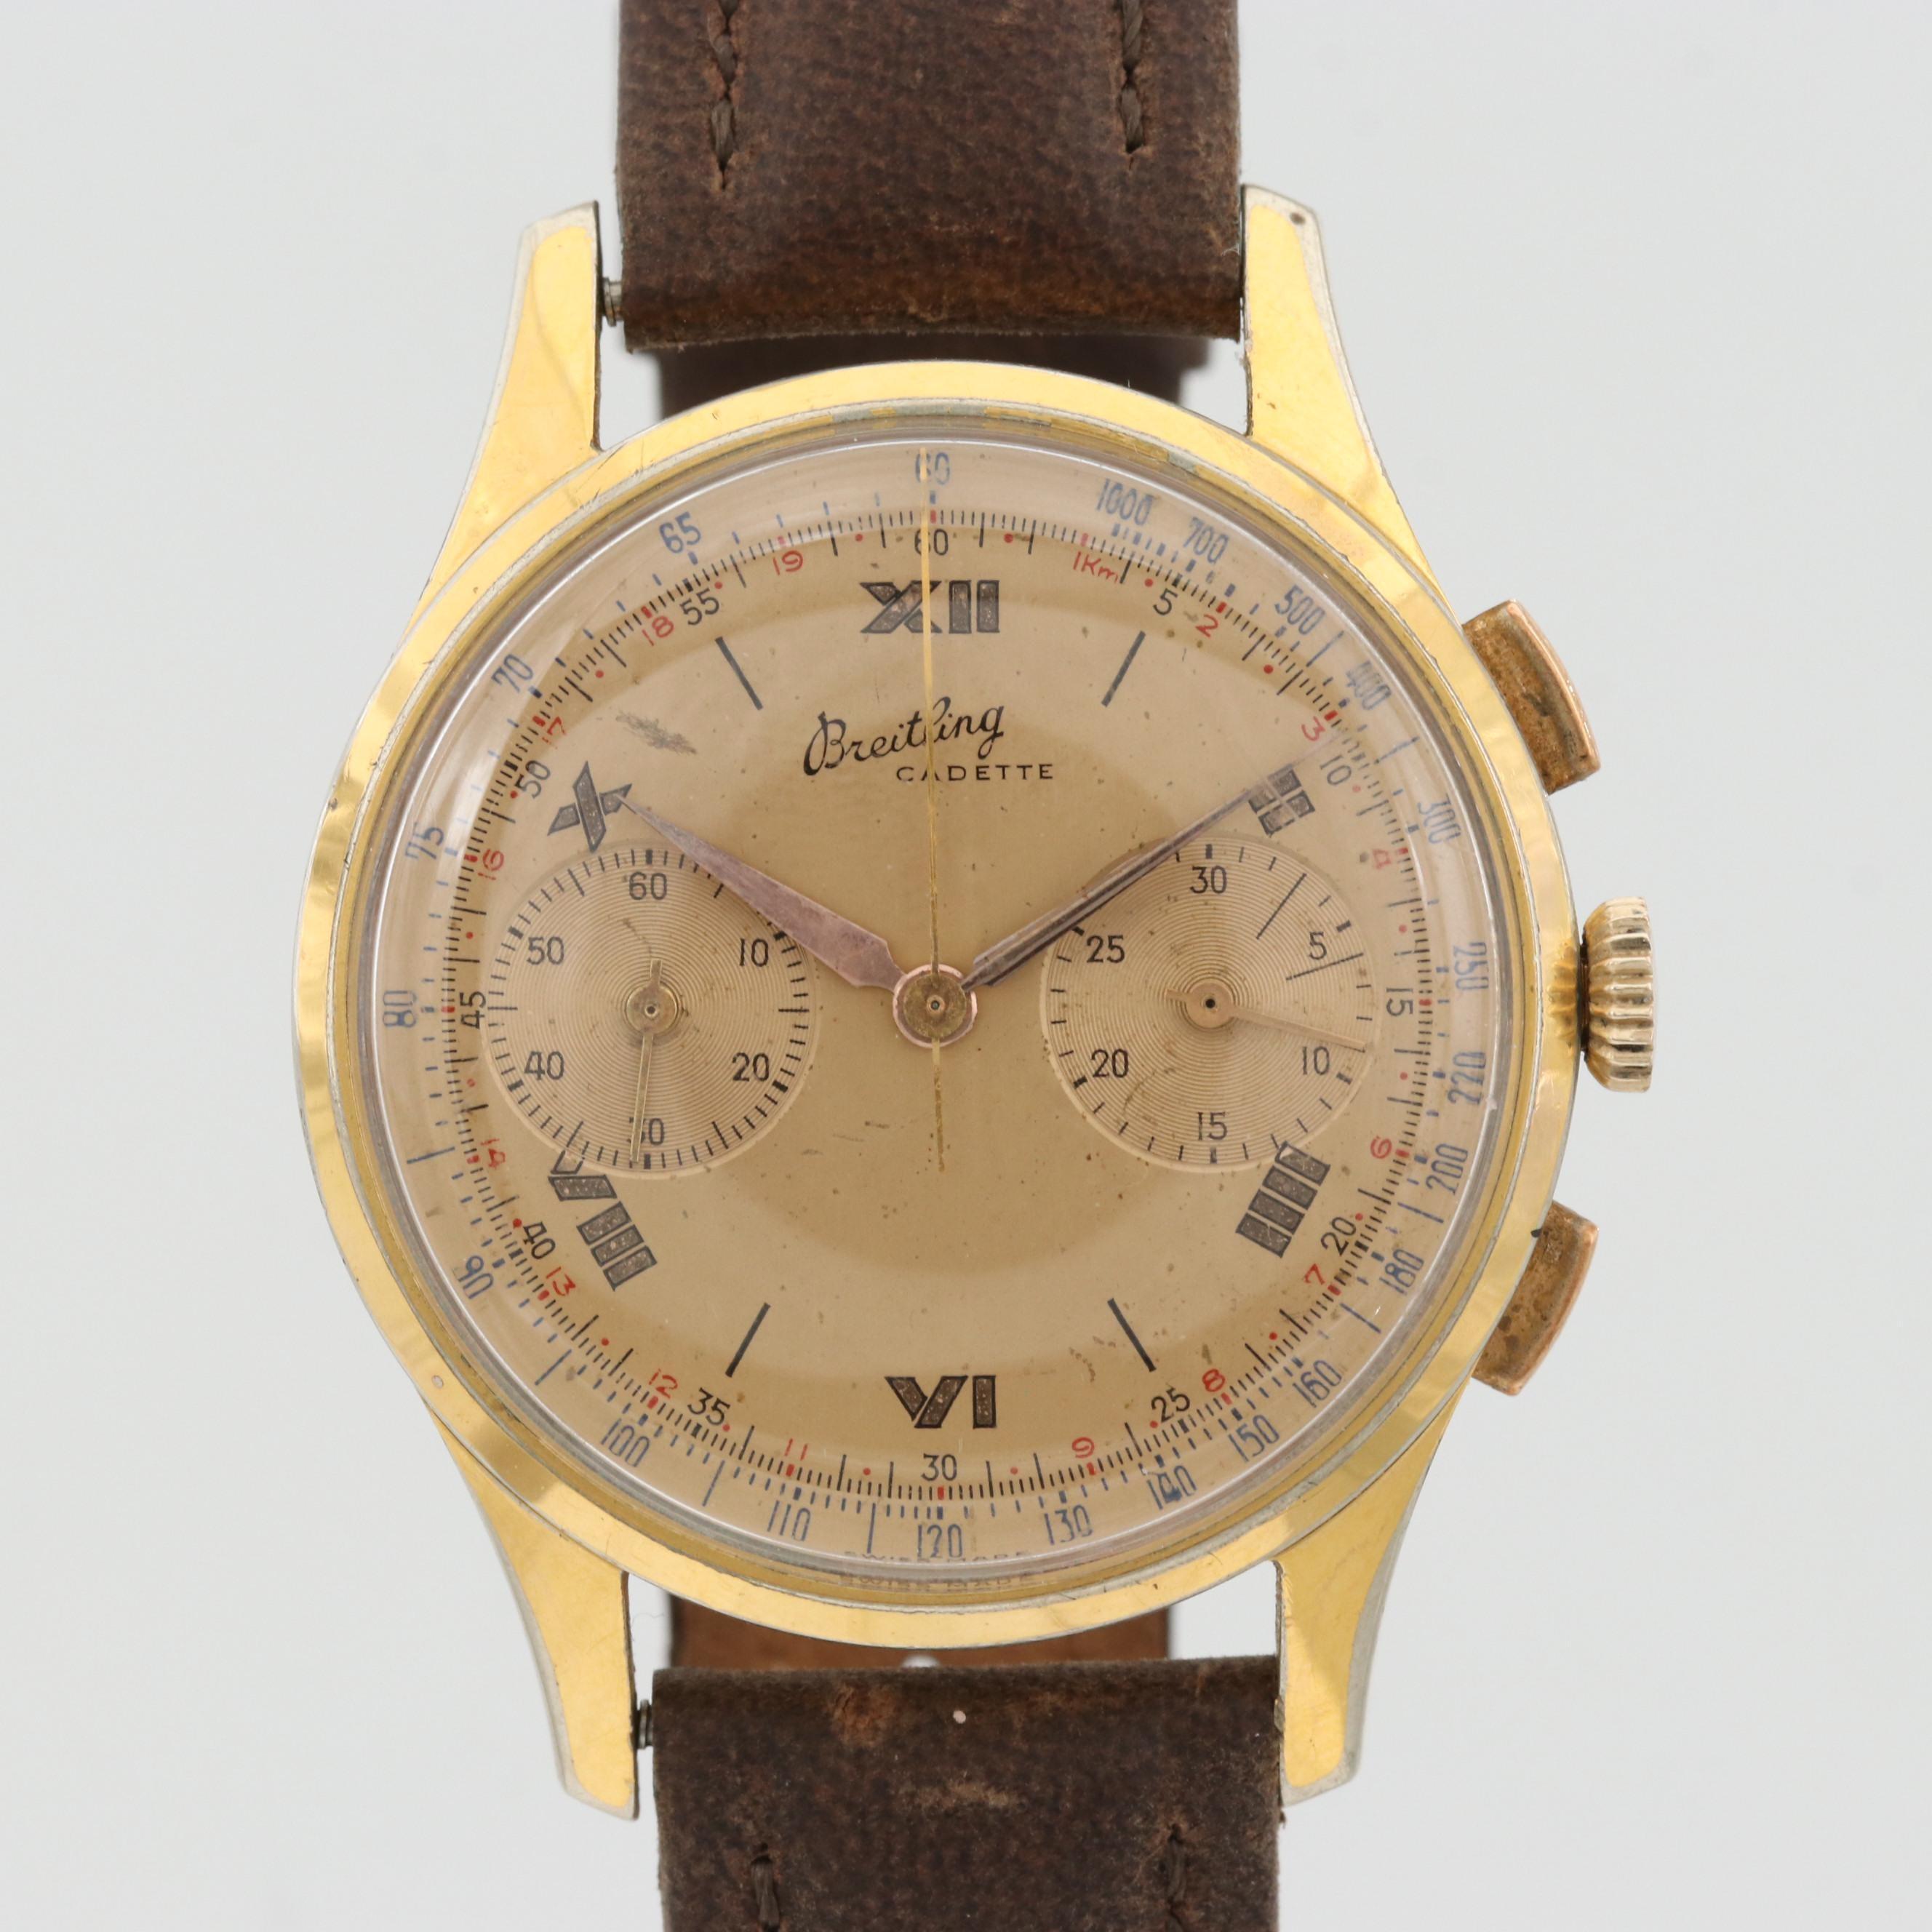 Vintage Breitling Cadette Gold Tone Stem Wind Chronograph Wristwatch, Circa 1950